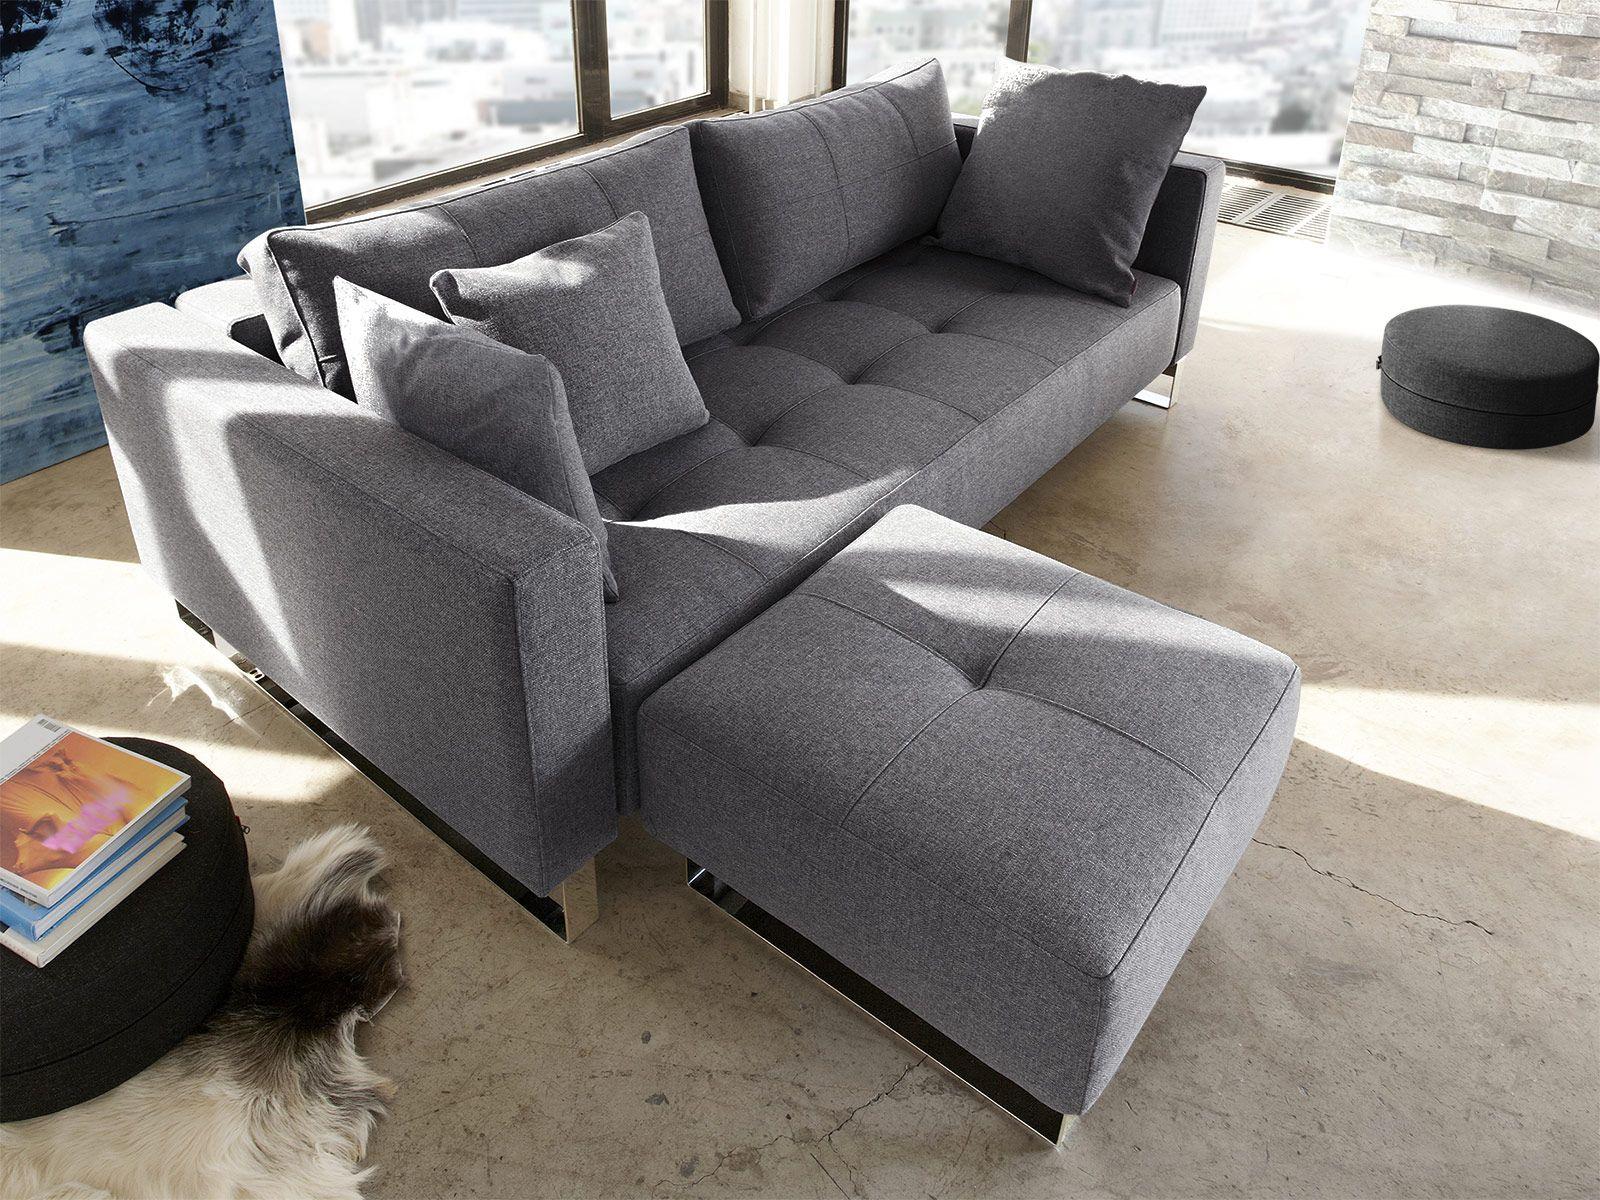 Schlafsofa Mit Federkern In Grau Kaufen Wilshere Schlafsofa Sofa Couch Mobel